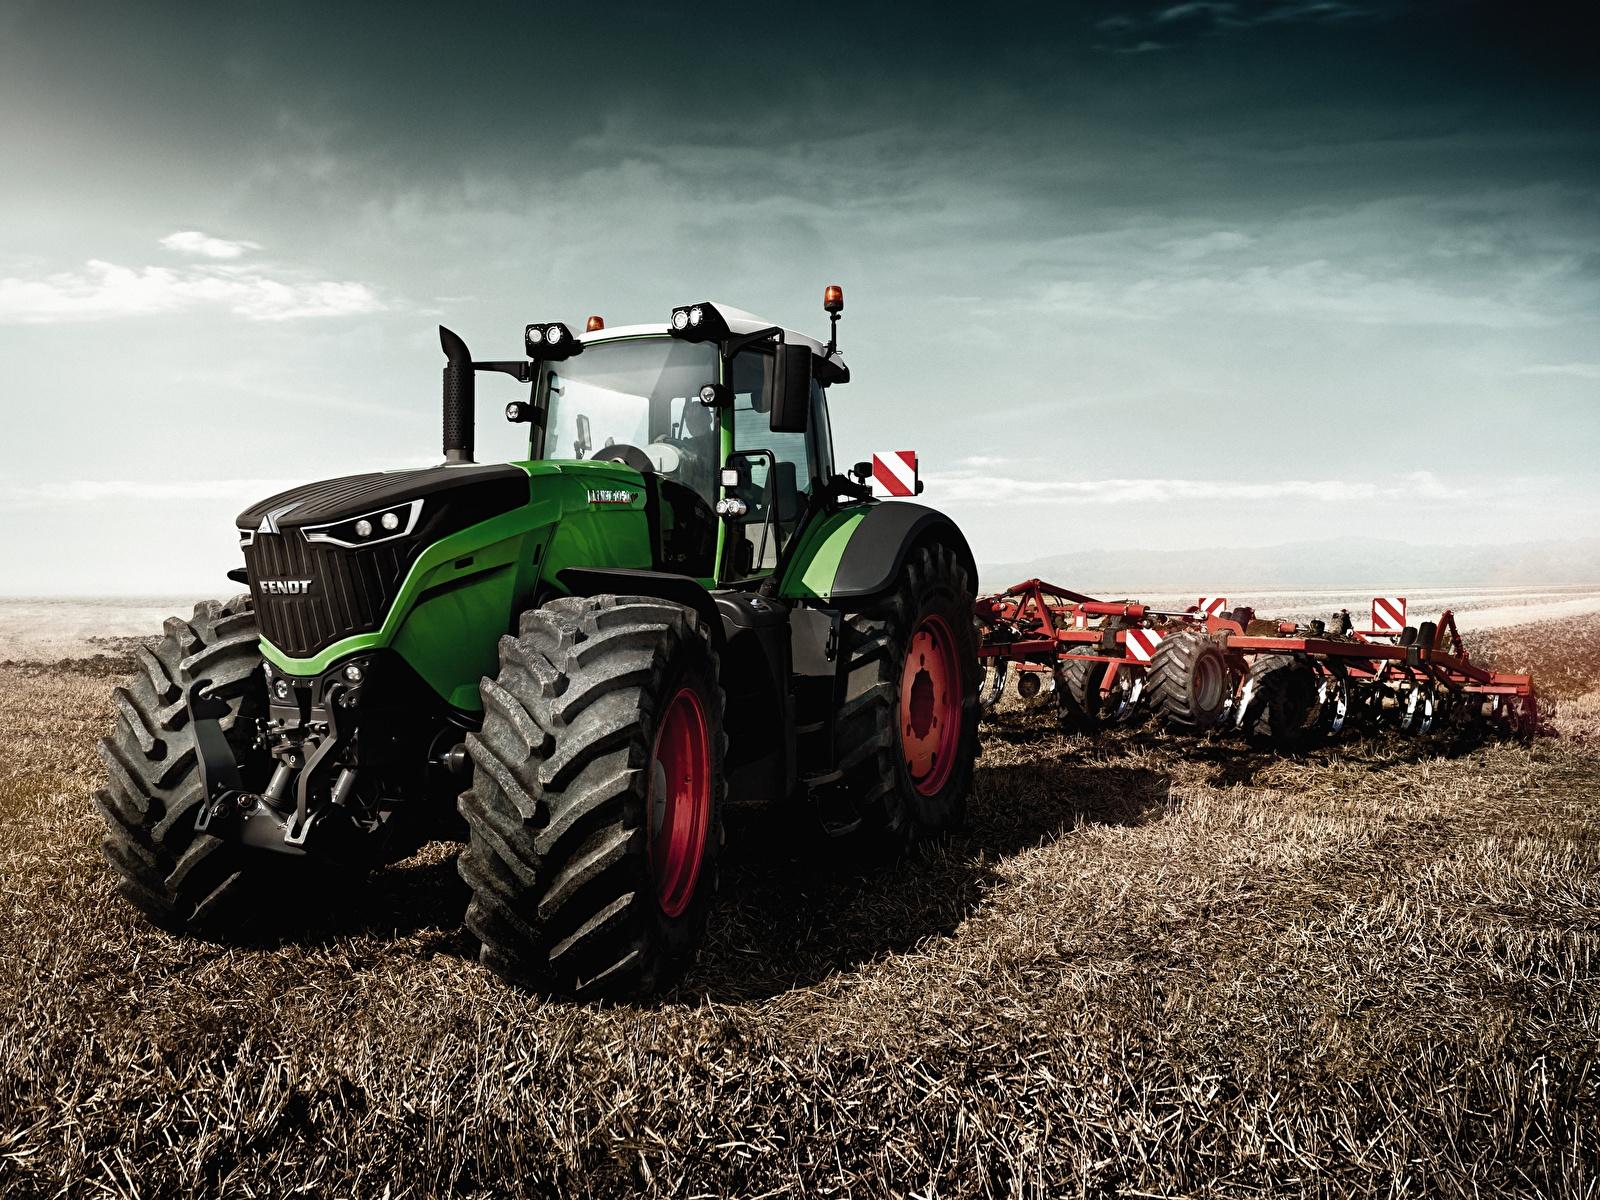 Wallpaper Agricultural machinery tractors 2015 17 Fendt 1600x1200 1600x1200